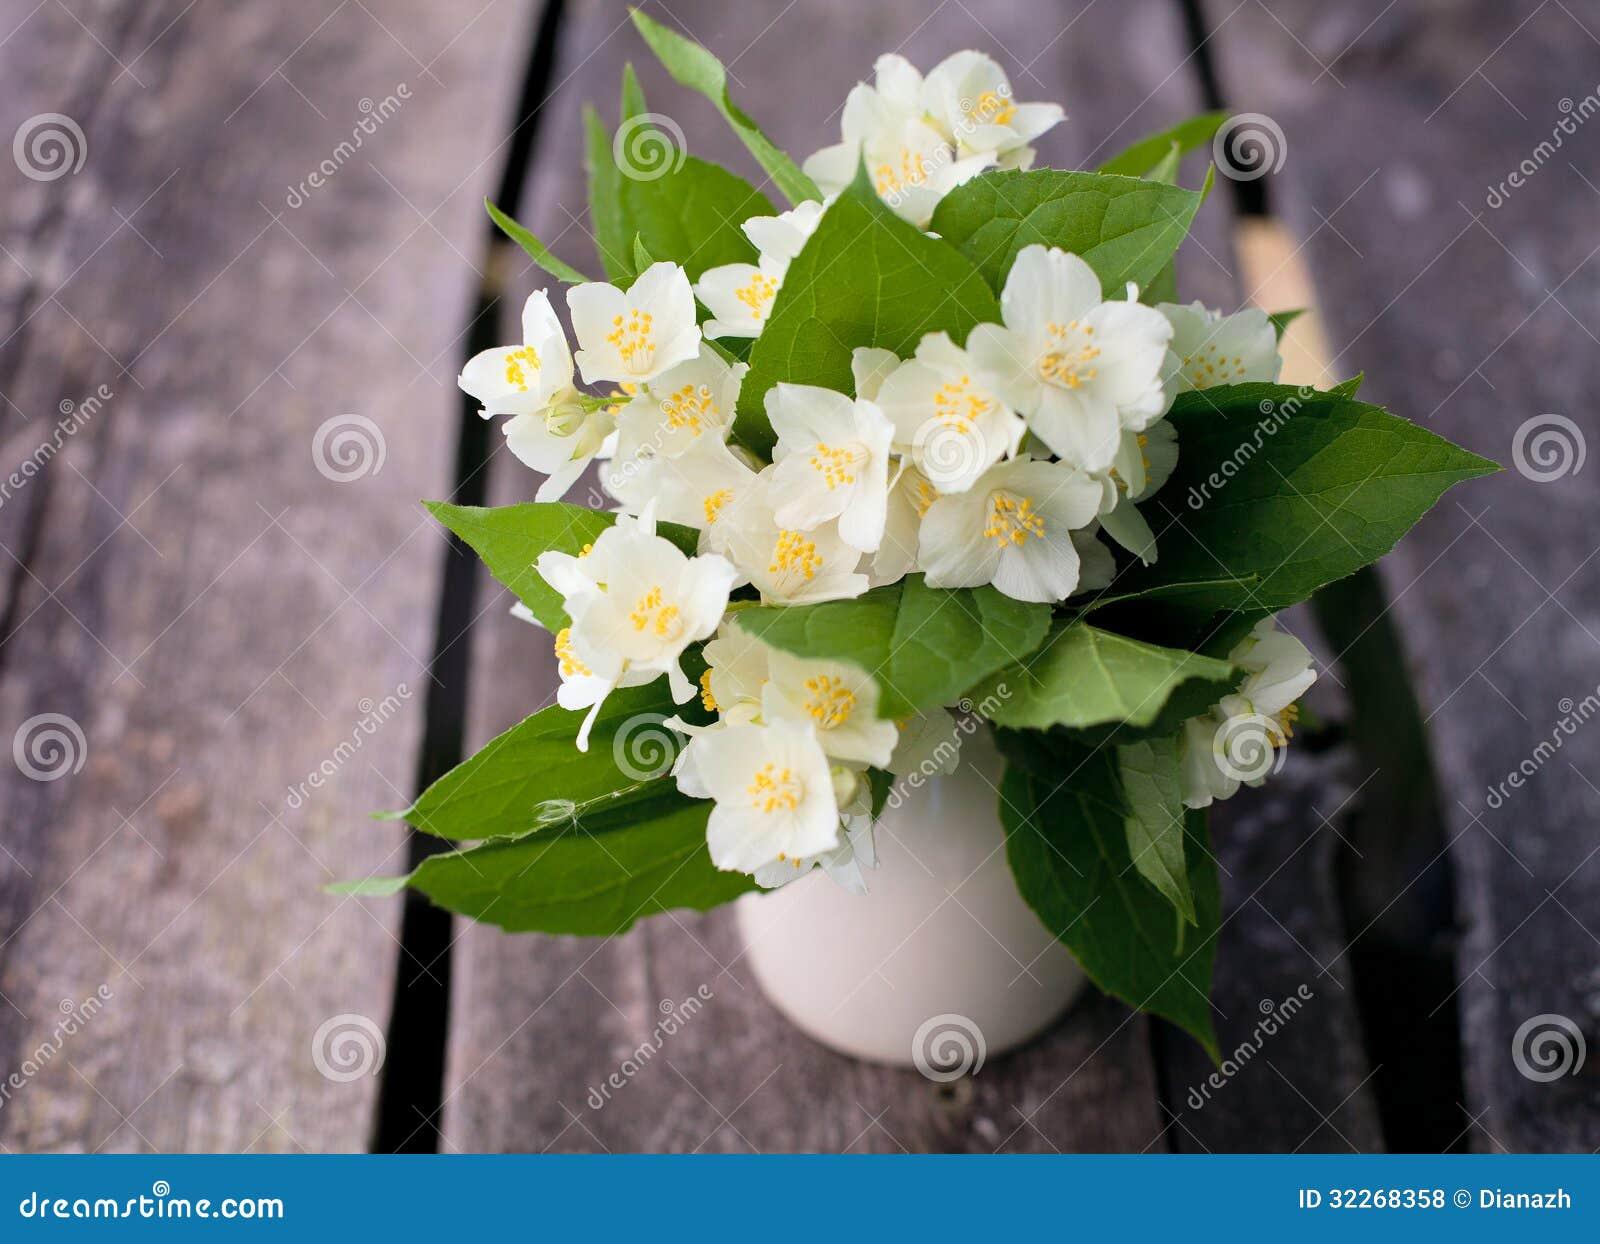 Bunch Of Jasmine Flowers On Wooden Garden Table Stock Photo Image